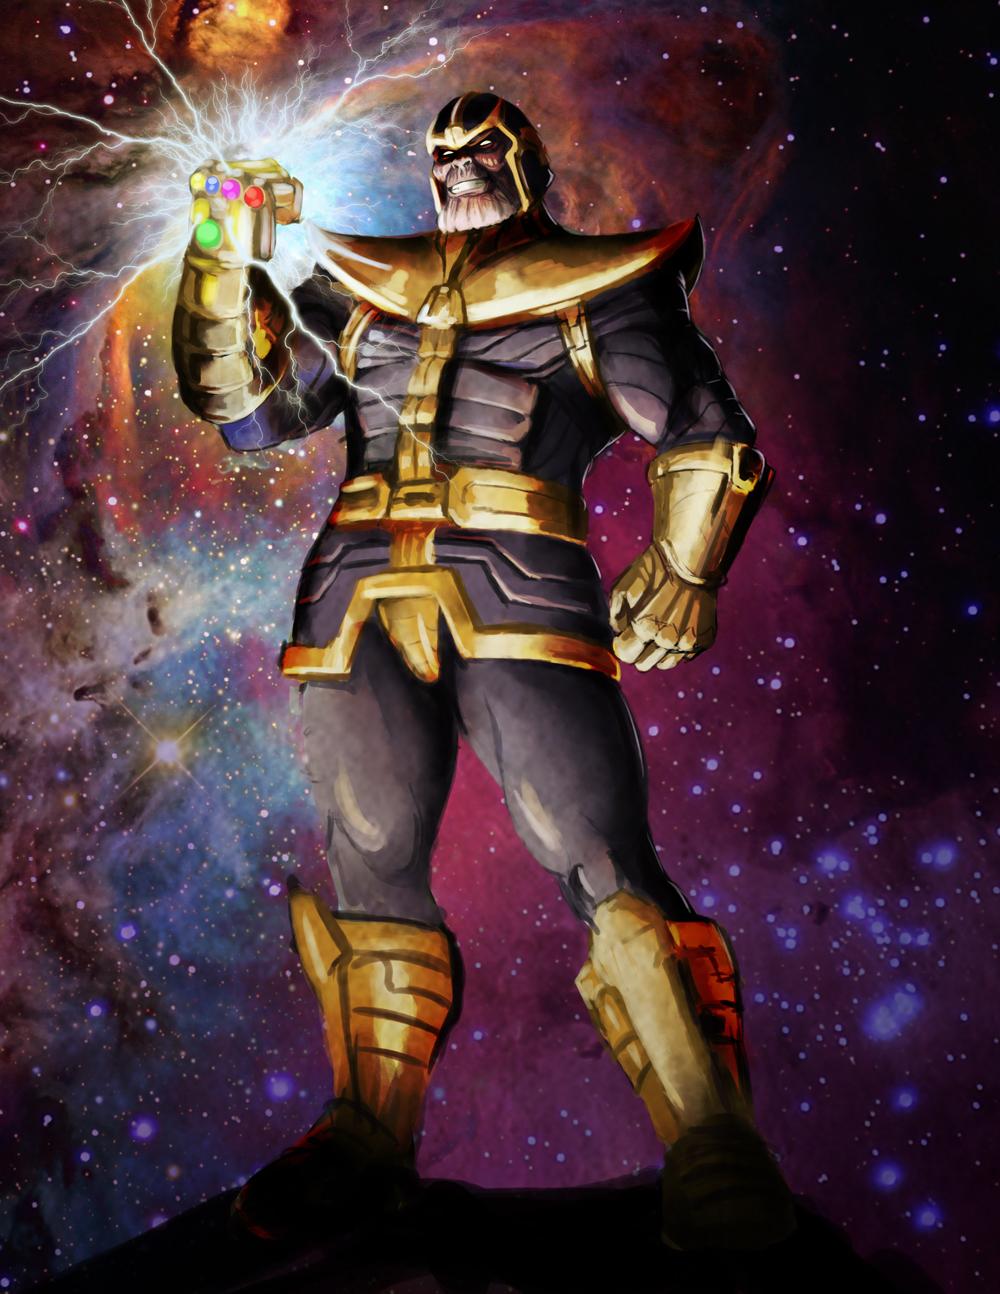 Thanos Character study more progress